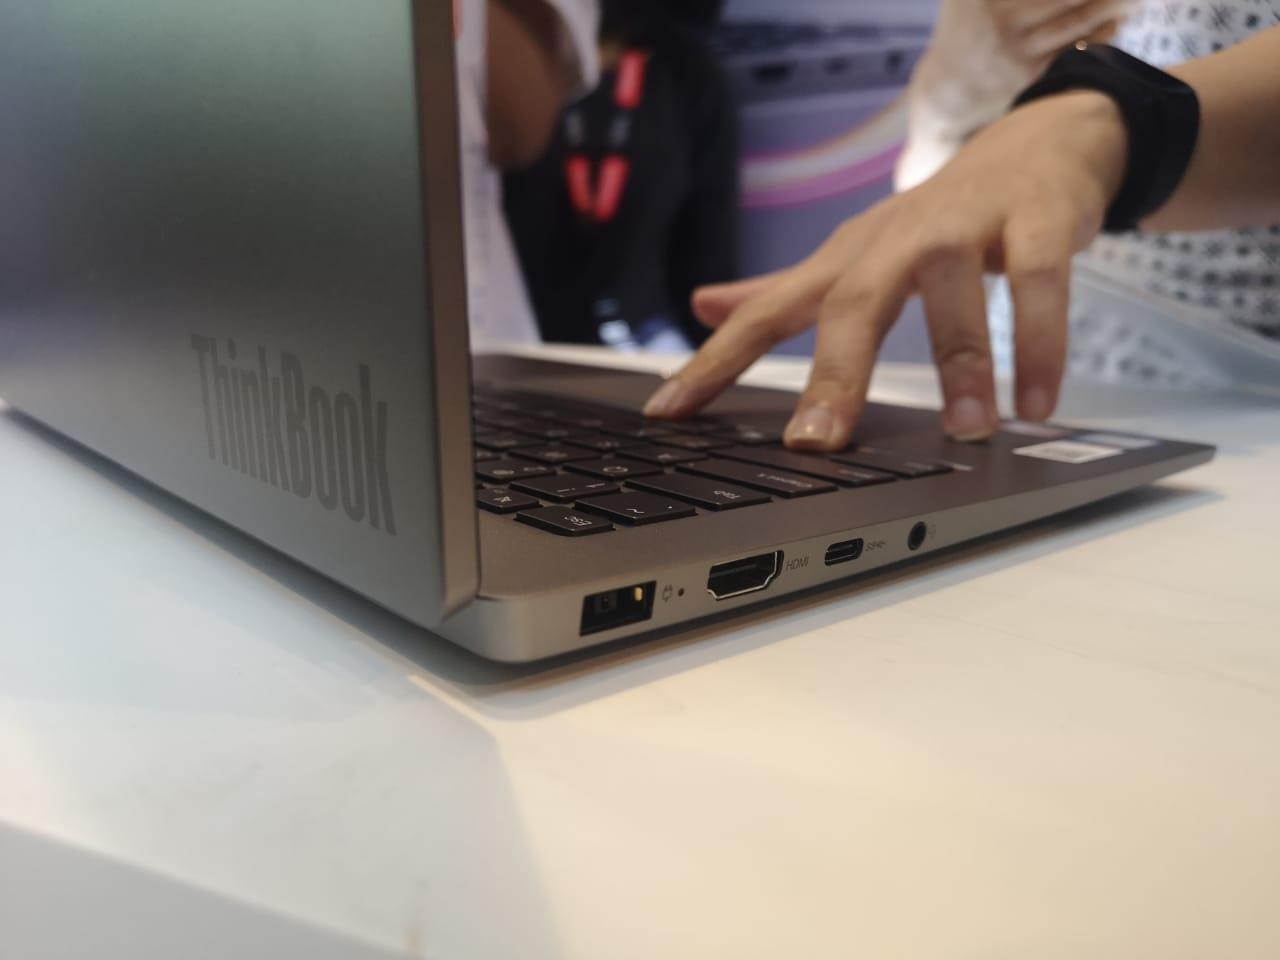 ThinkBook Jadi Varian Baru Lenovo, Targetkan Pengusaha Muda